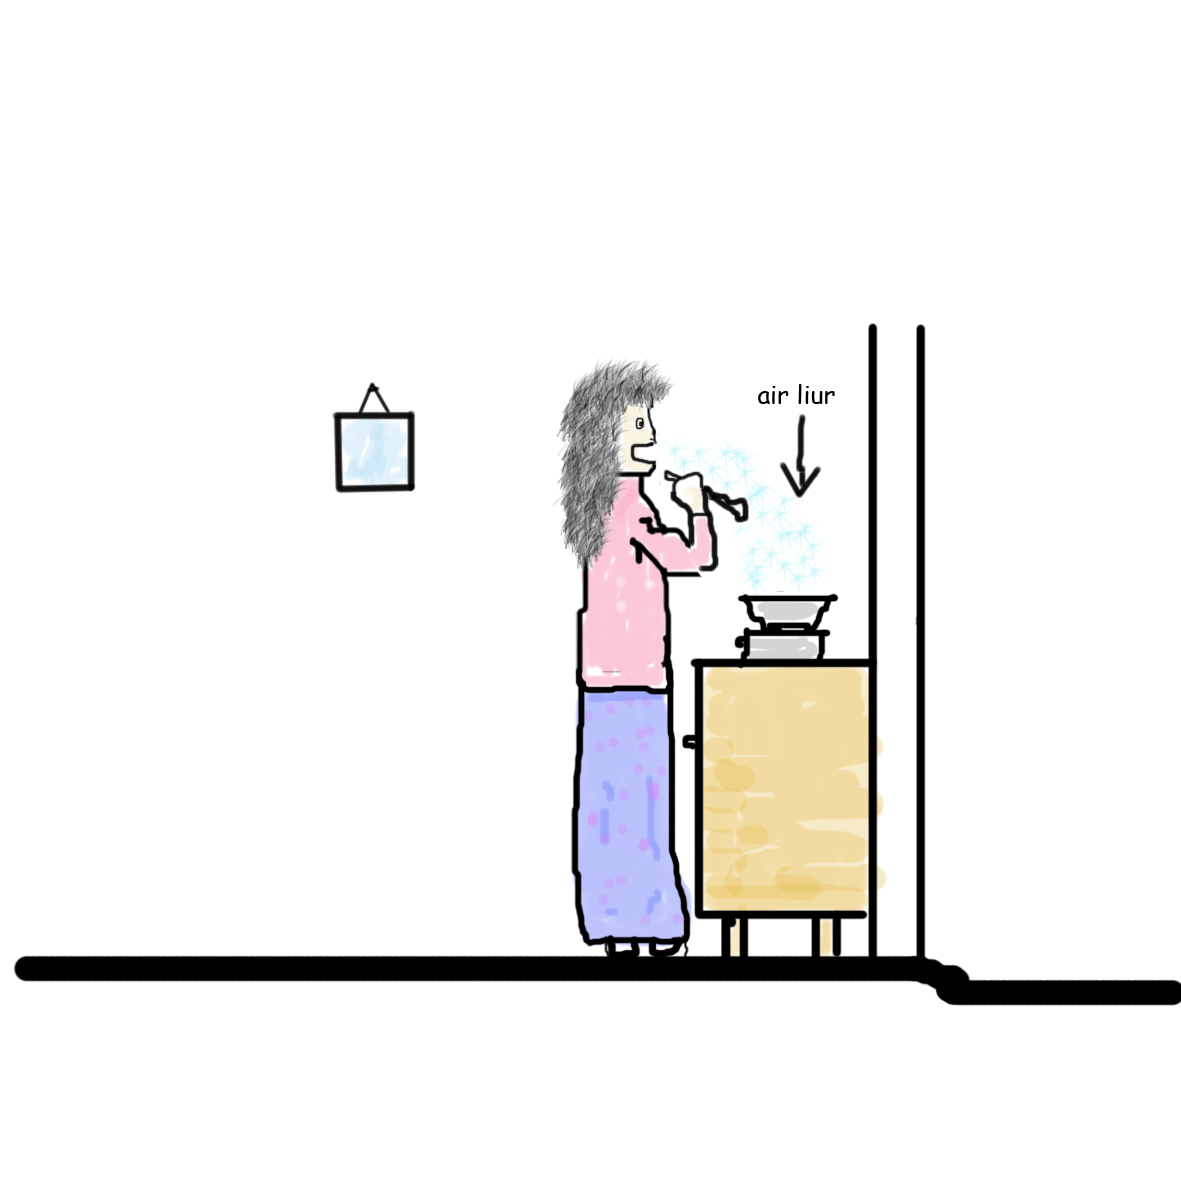 Makanan Kah Kalo Aku Tau Ish Geli Wooo Lagipun Tak Manis Di Pandang Orang Bila Menyanyi Kat Dapur Sopan Gitu Auuww